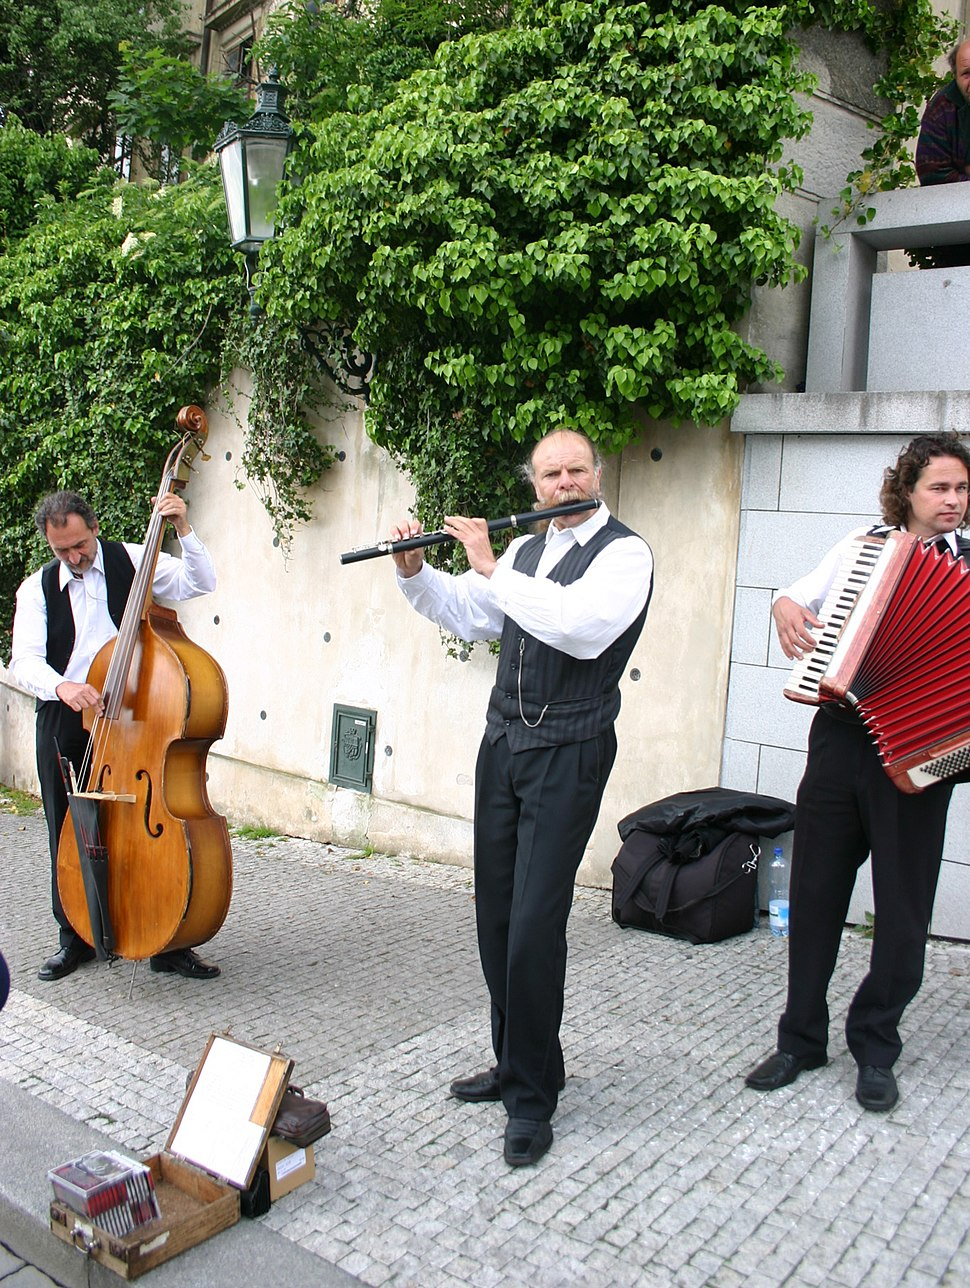 Prague Street Musicians (Polka Band)